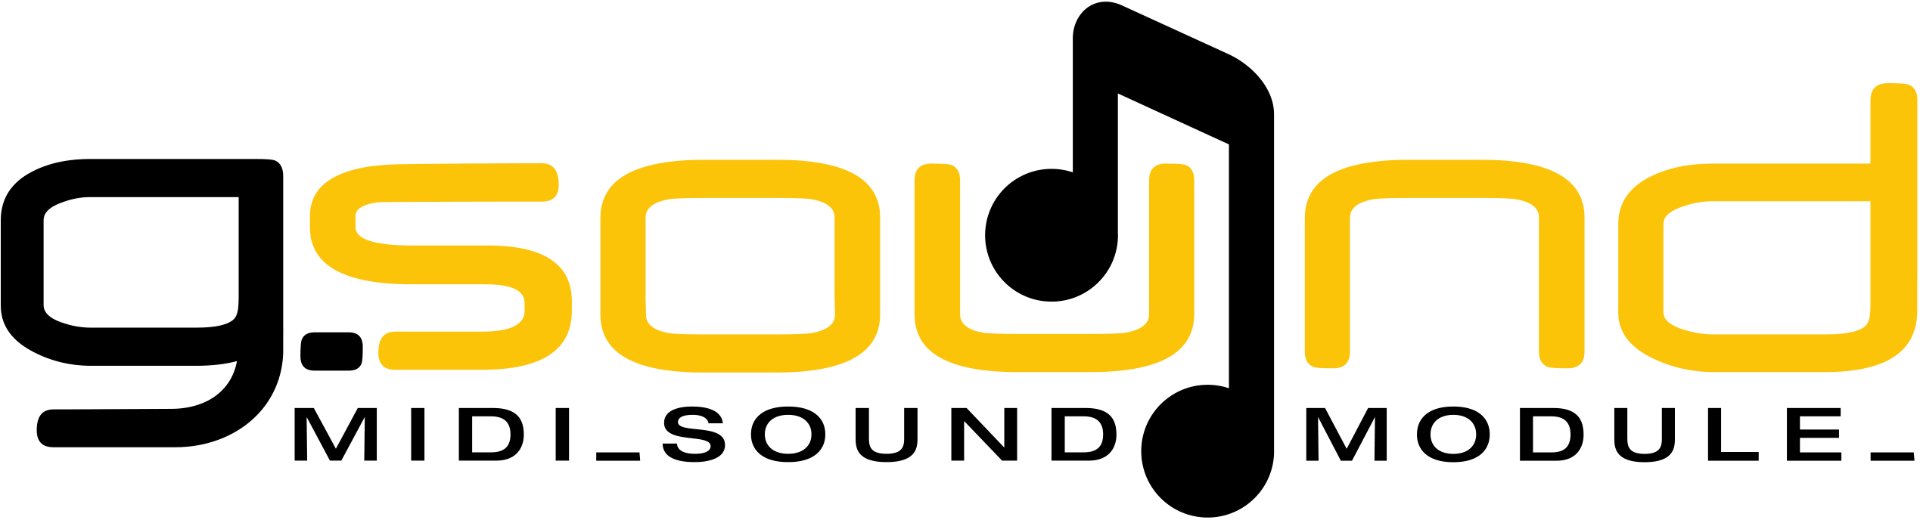 logo gSound